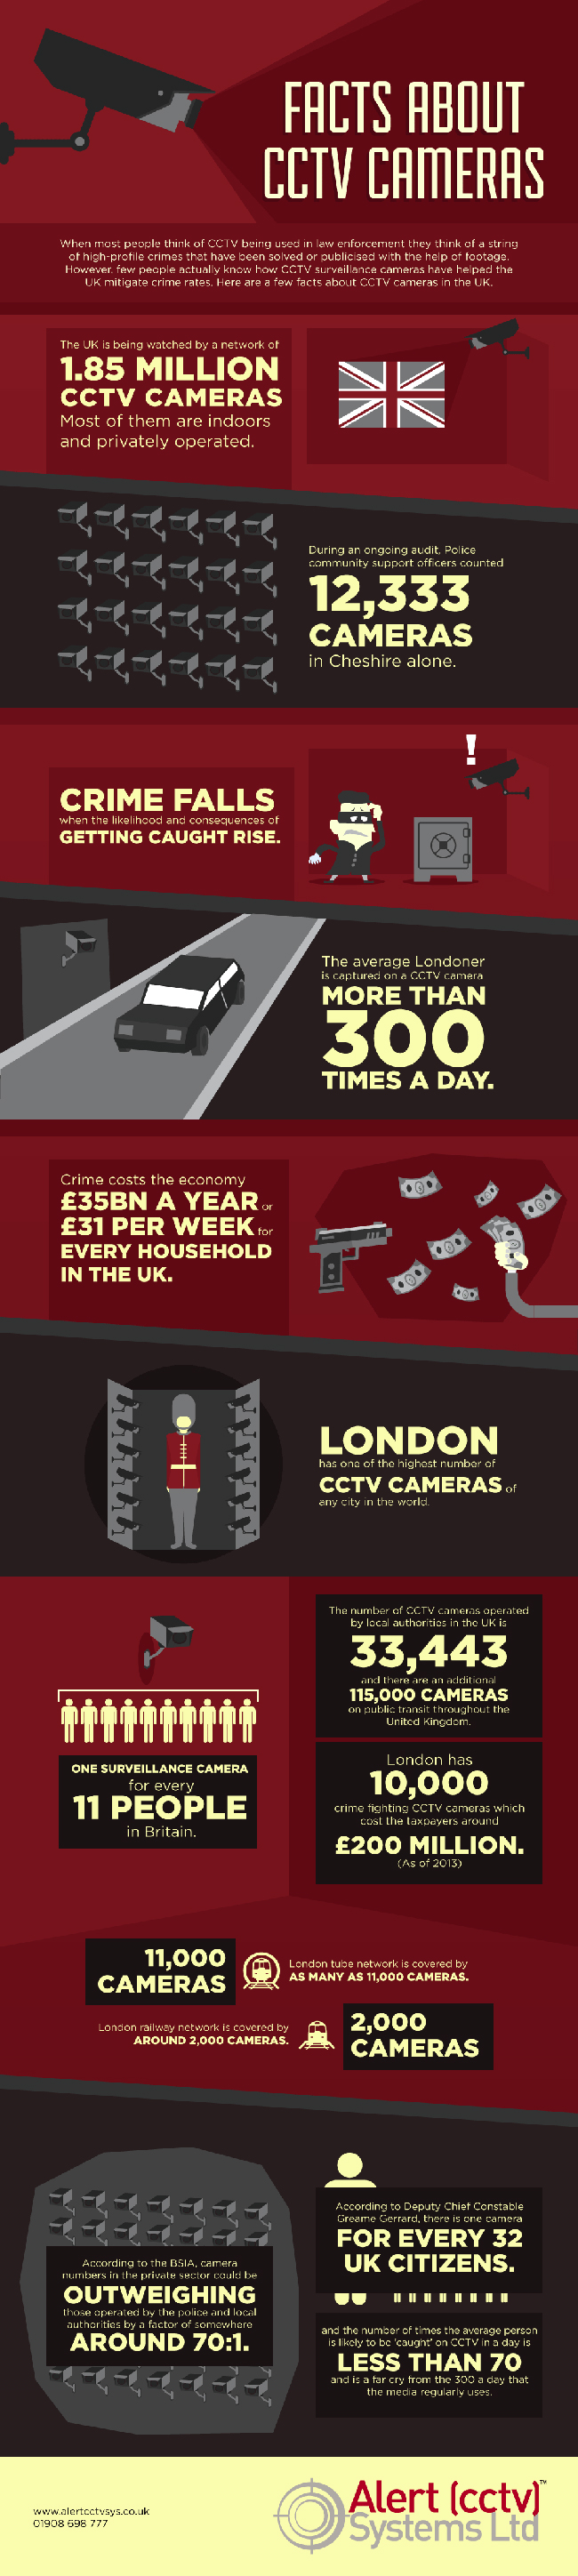 cctv facts uk